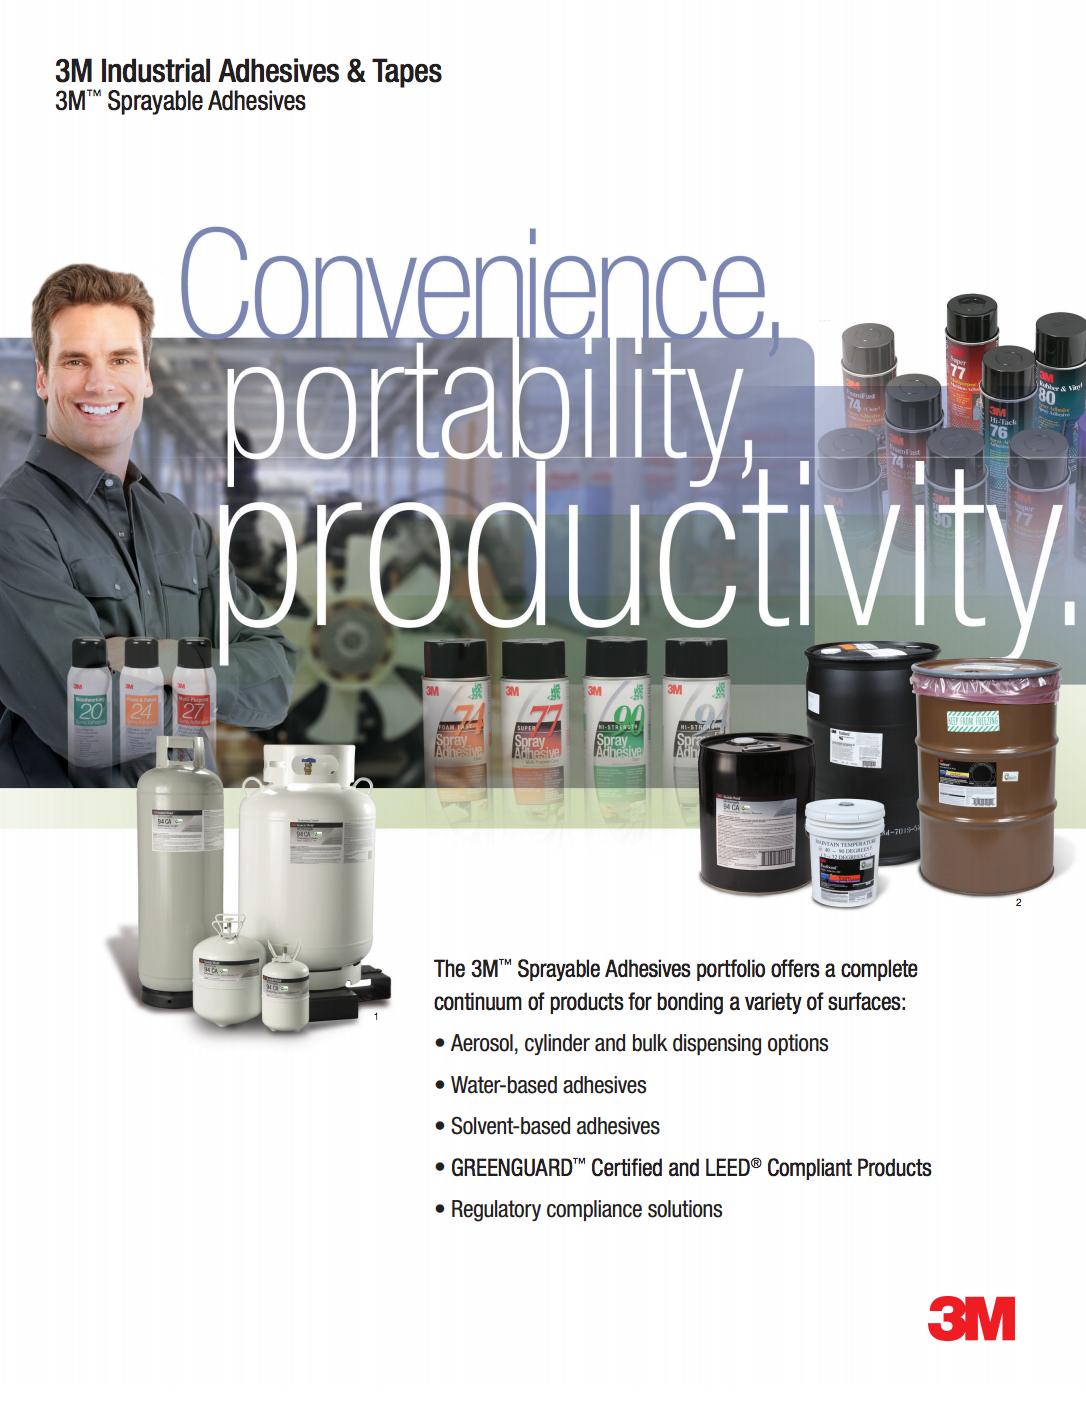 3M Sprayable Adhesives Brochure